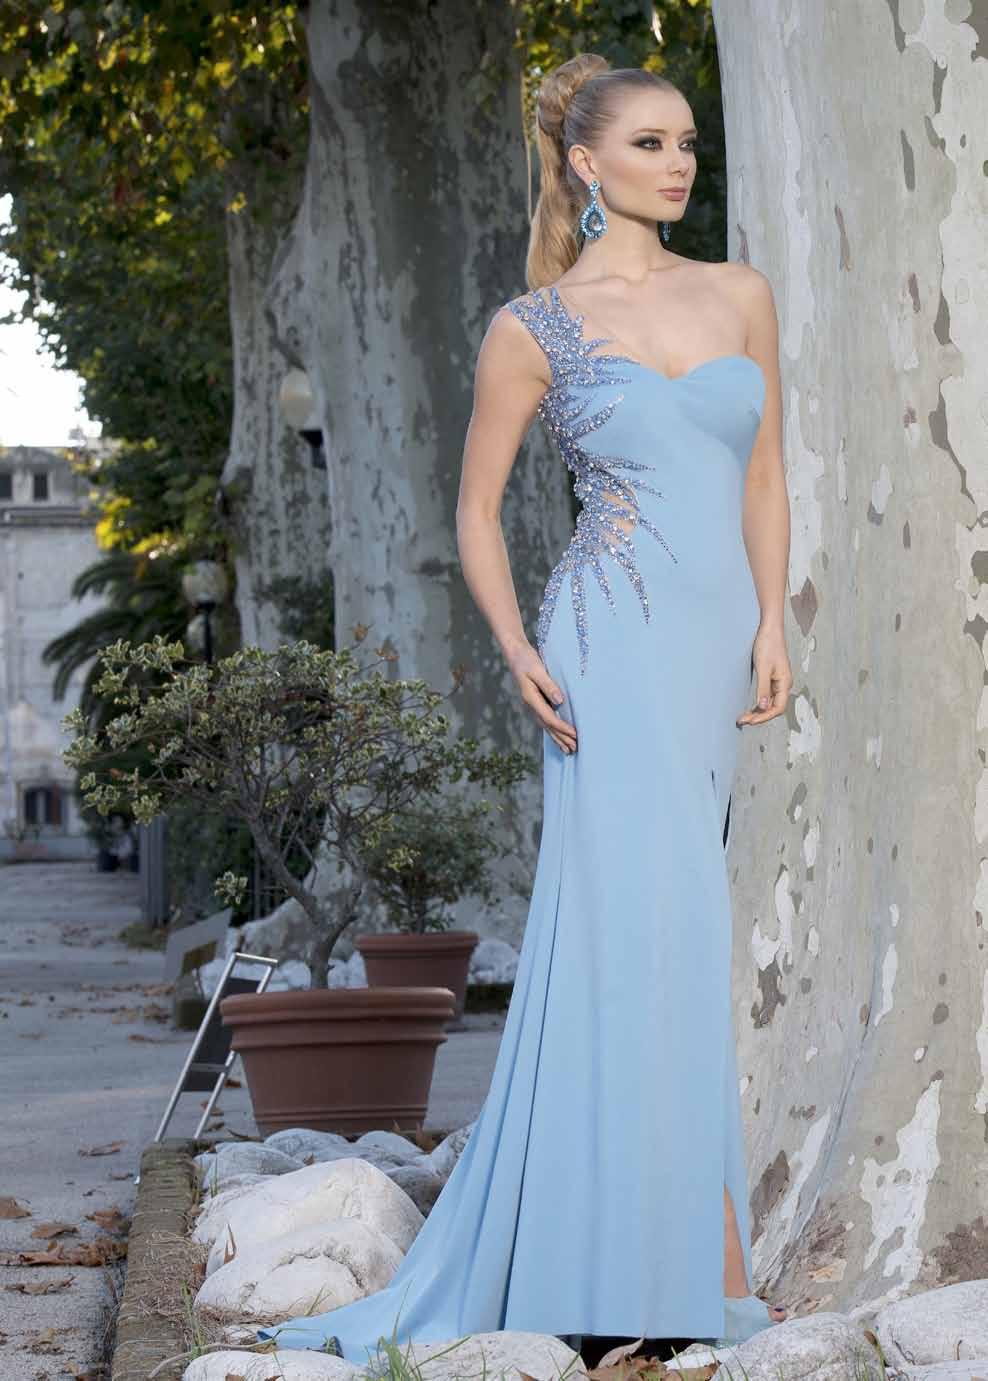 8afc499b6c75 Cloè Haute Couture - Beautiful Moda ALTA MODA SPOSI CERIMONIA di ...